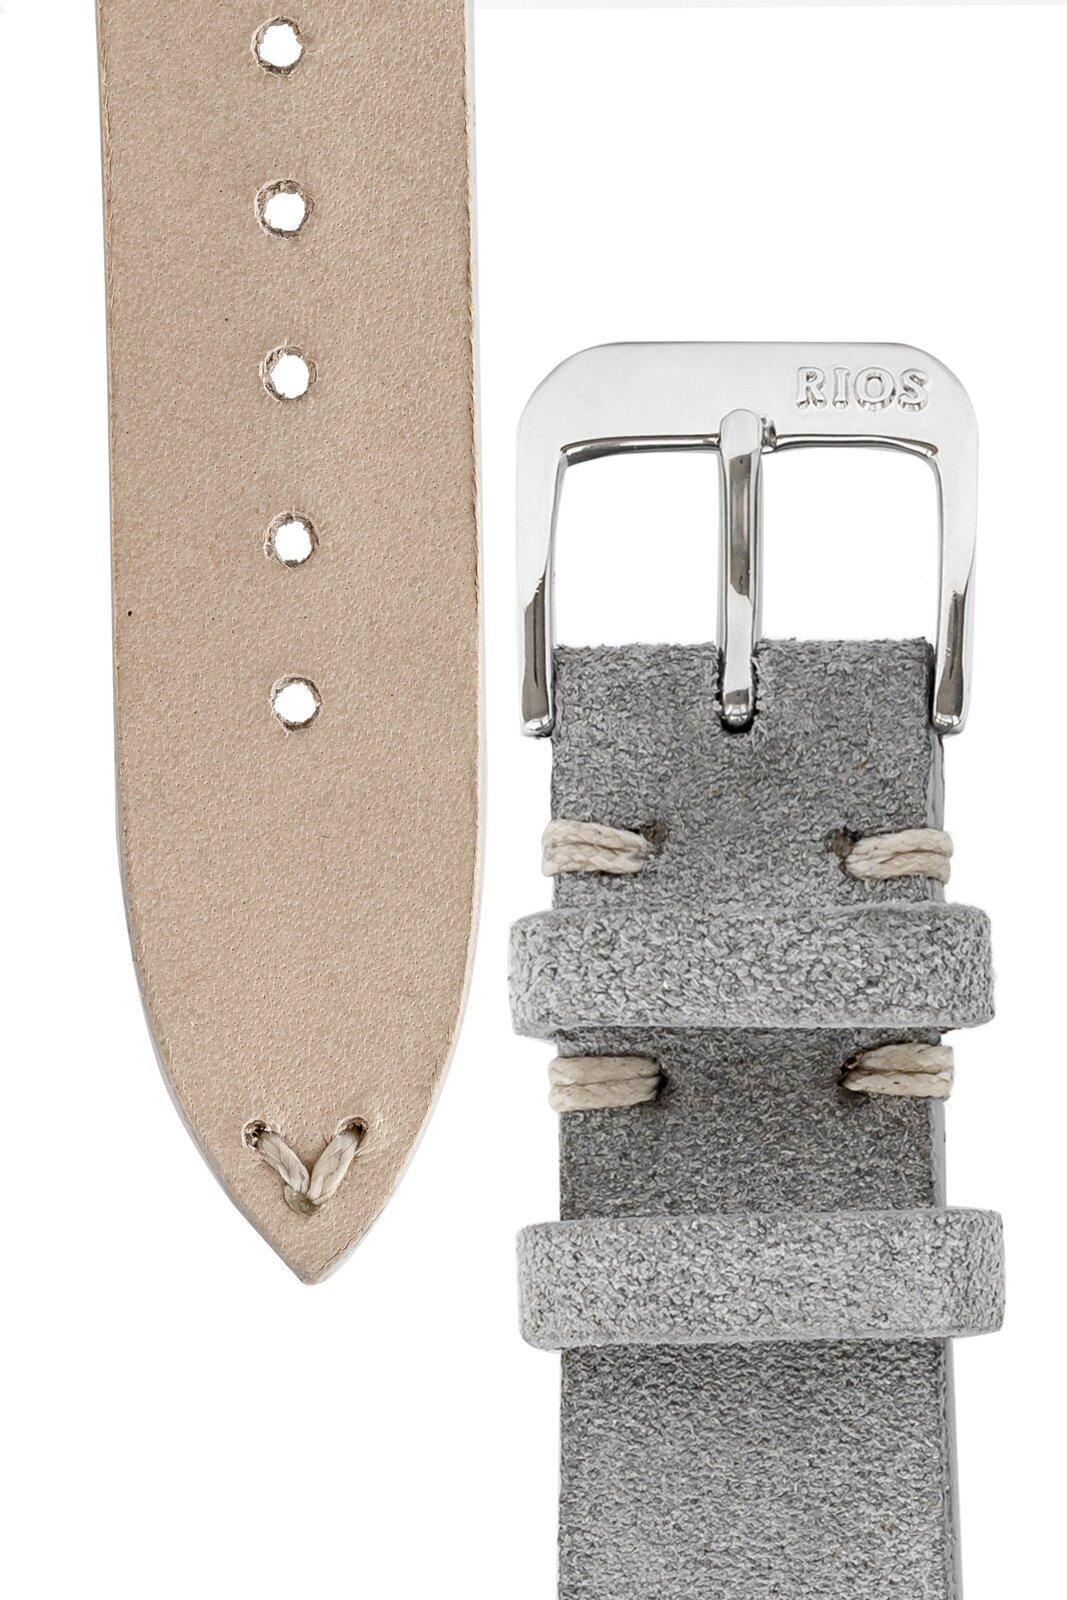 Rios1931 HUDSON Genuine Suede Leather Watch Strap in STONE GREY